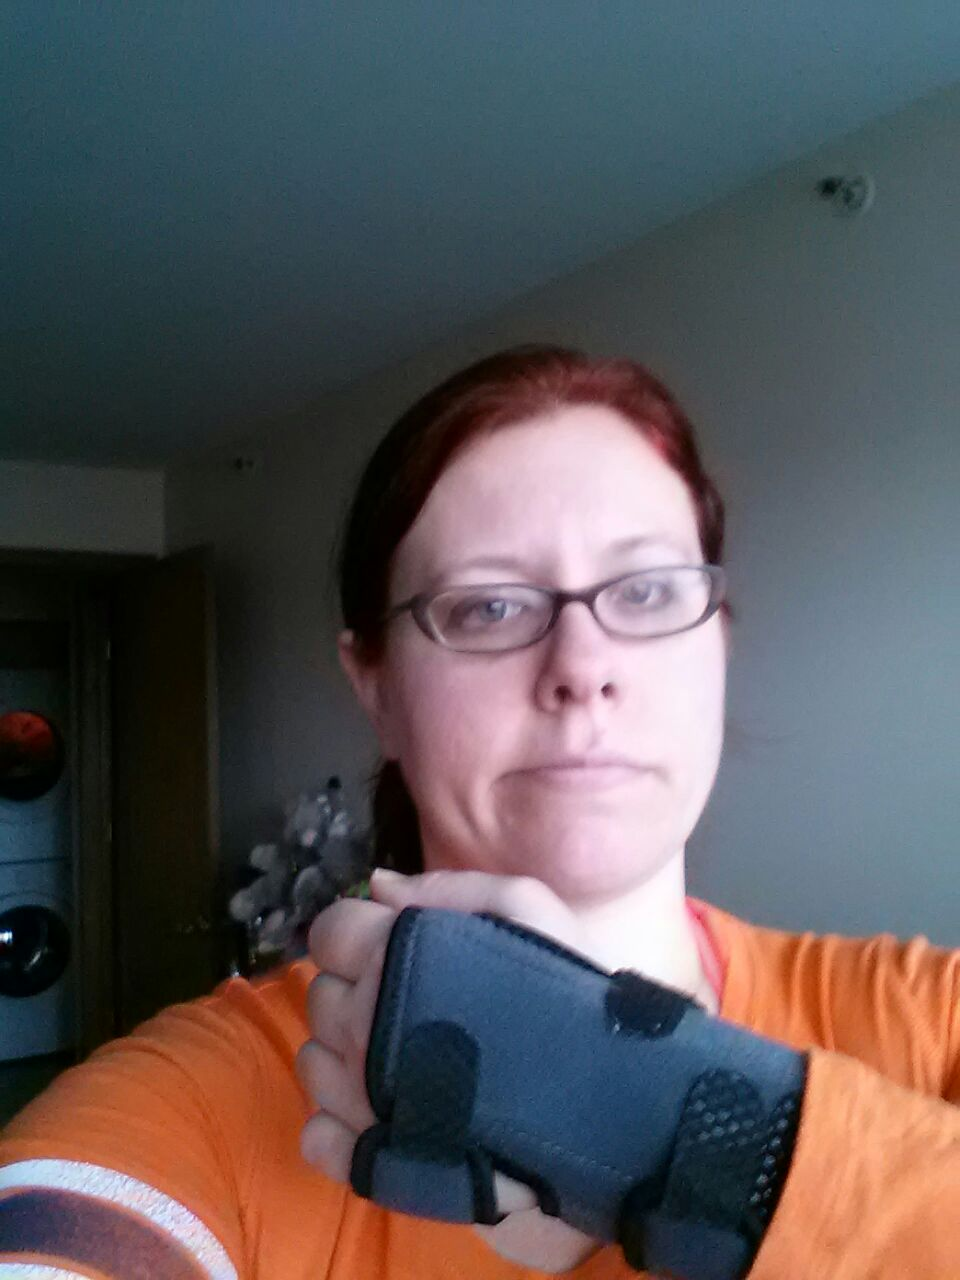 accident prone wrist